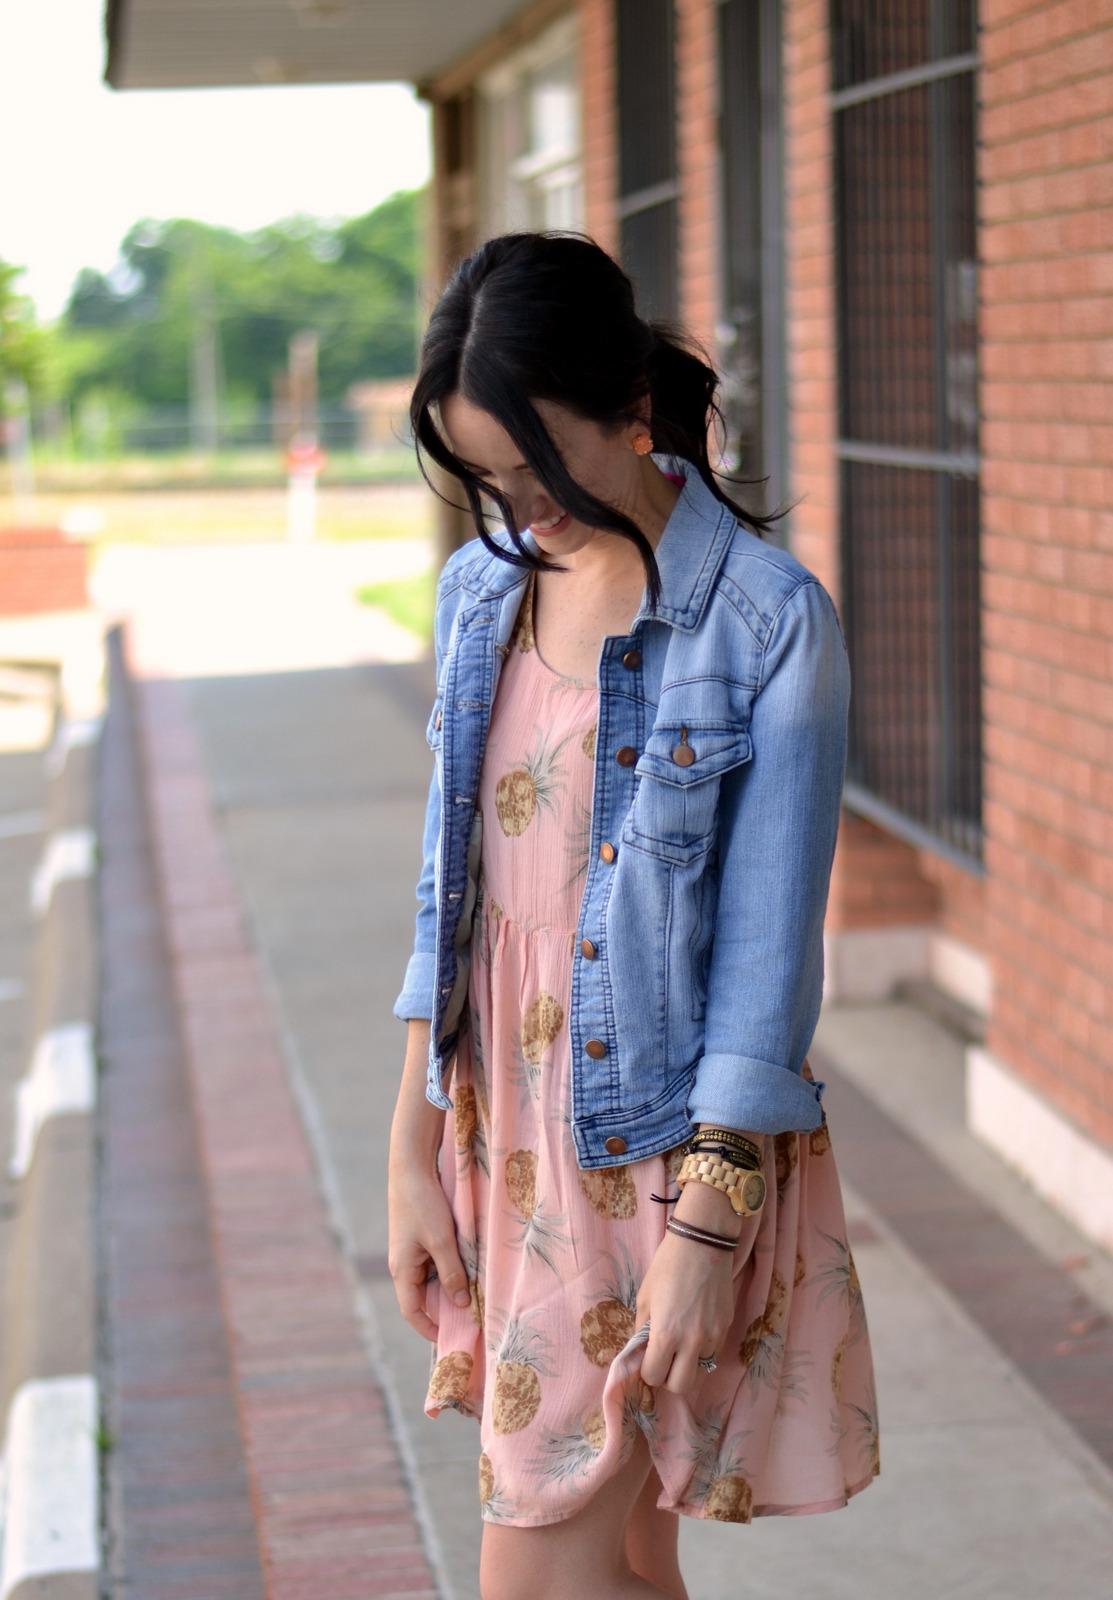 Summer pineapple print dress from Boohoo